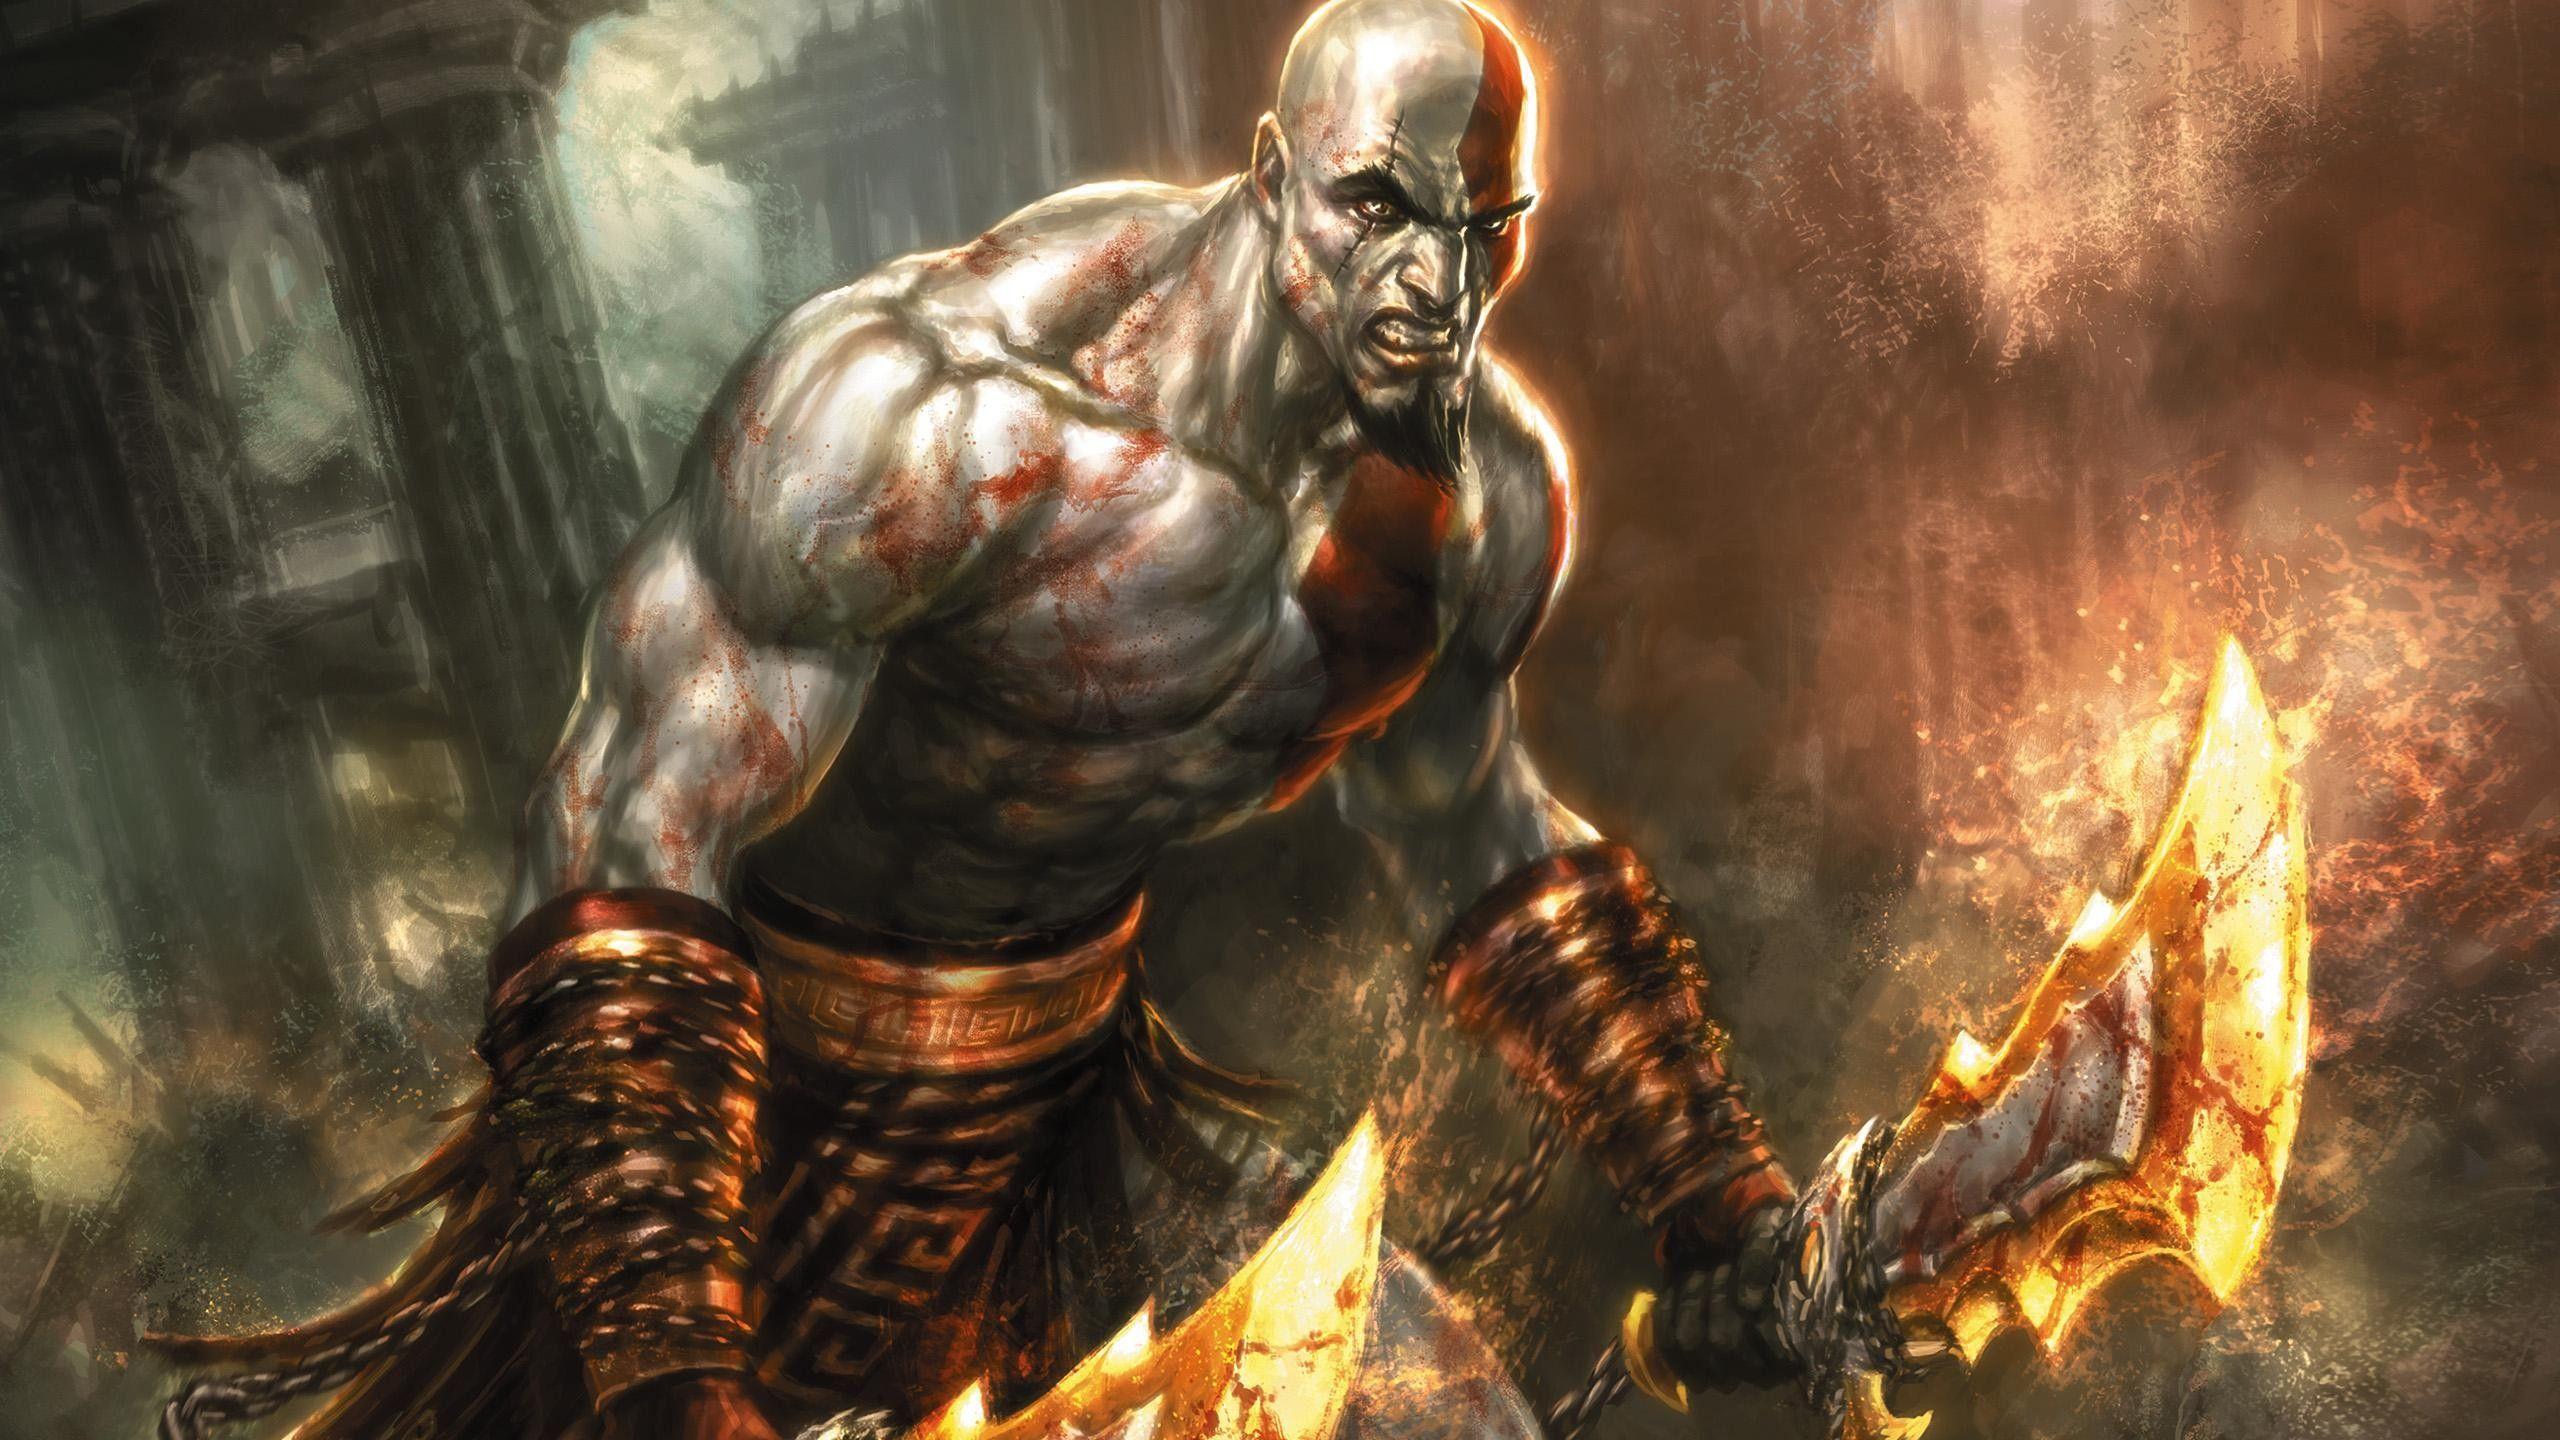 god of war: kratos - pesquisa google | god of war | pinterest